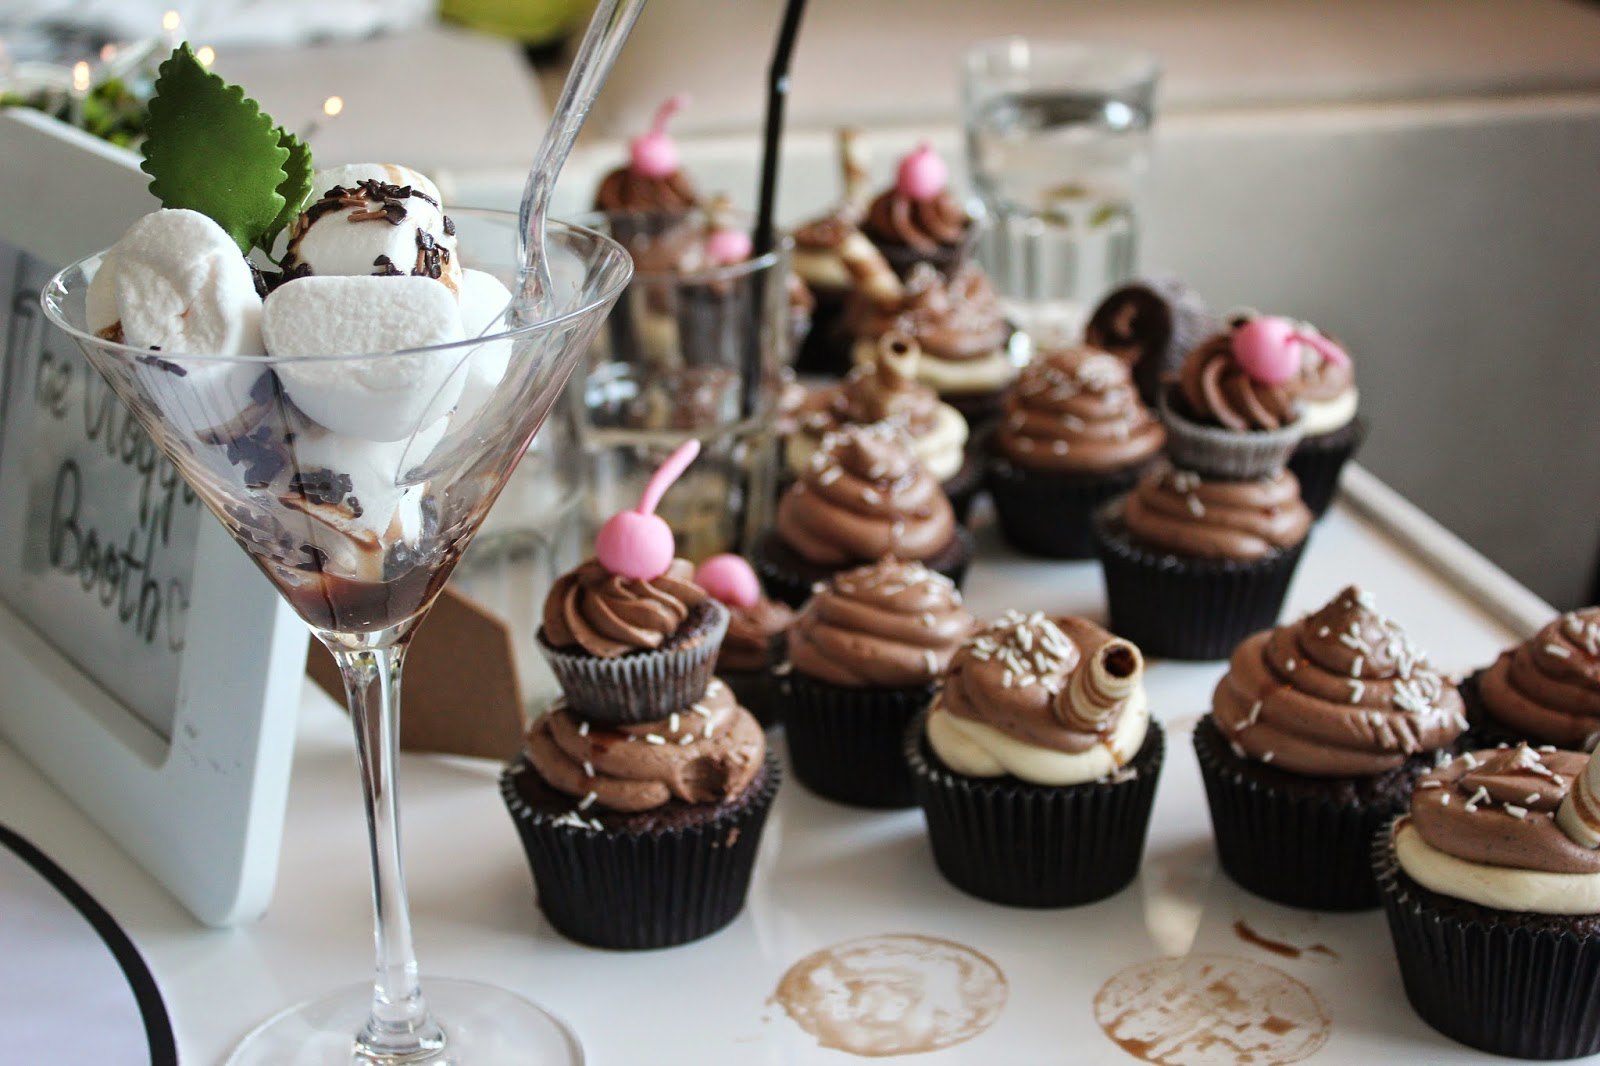 bloggers-love-fashion-week-food-cupcakes-marshmallows